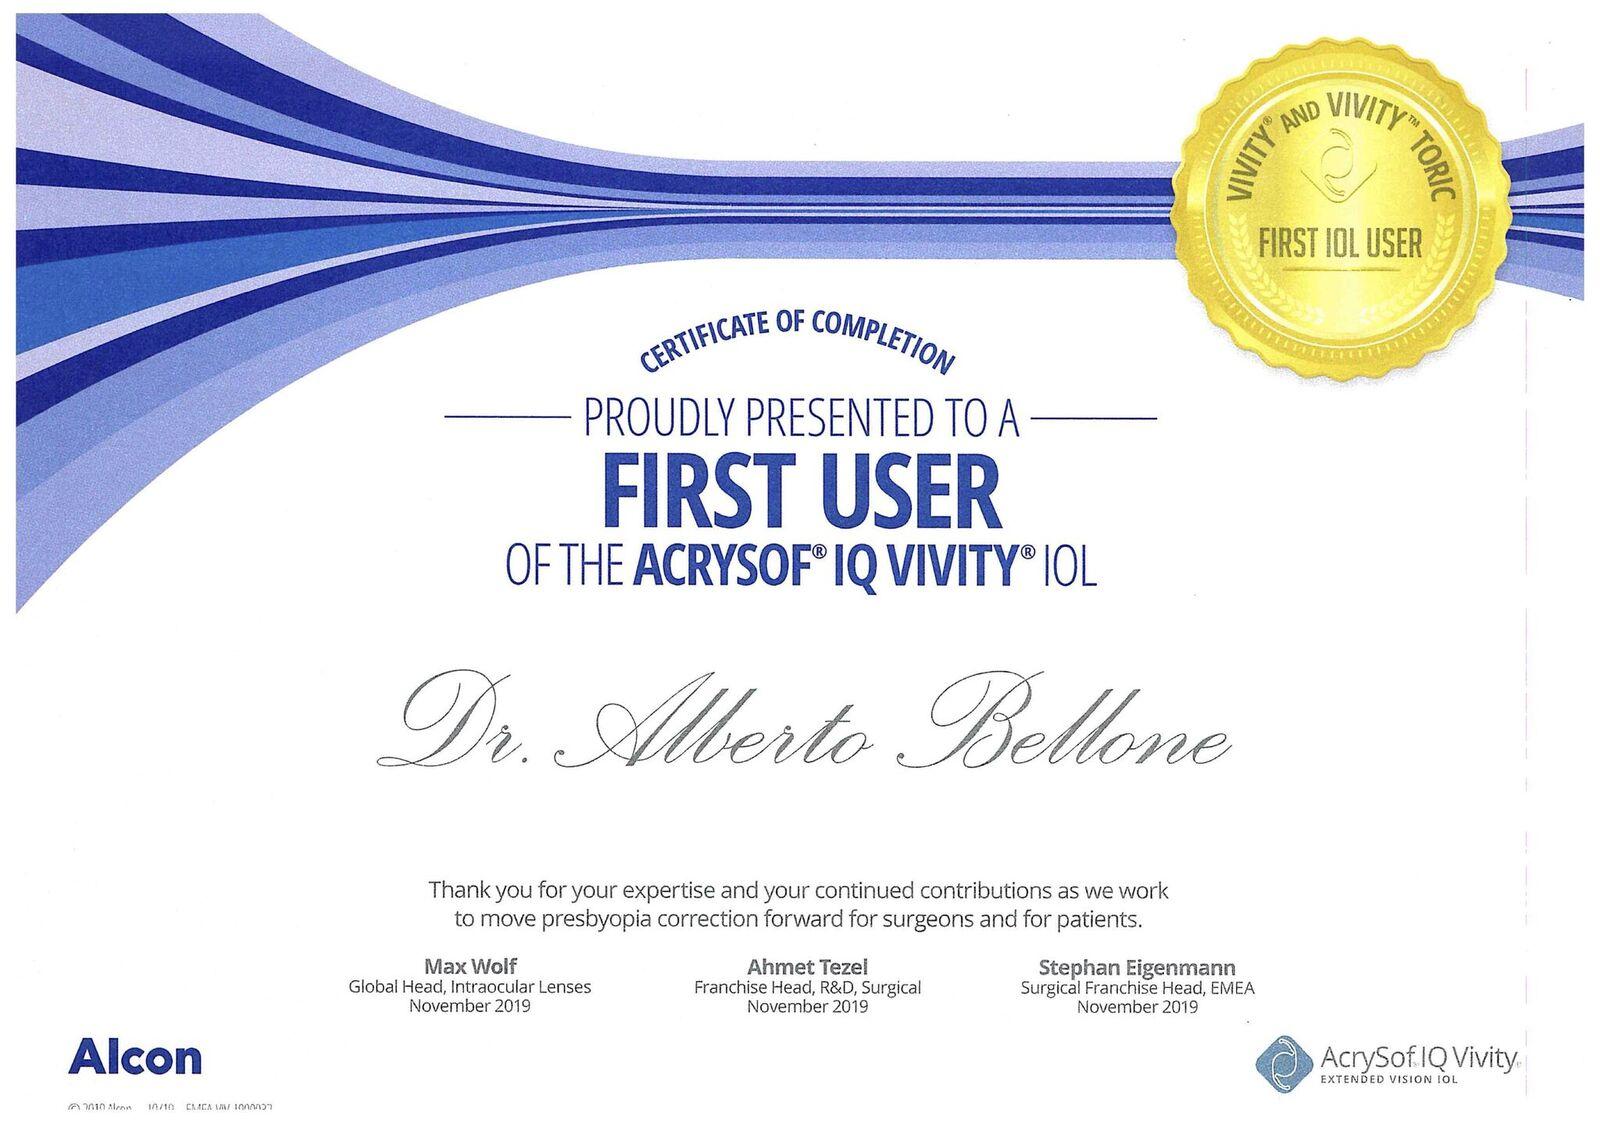 acrysof iq vivity first user certificate